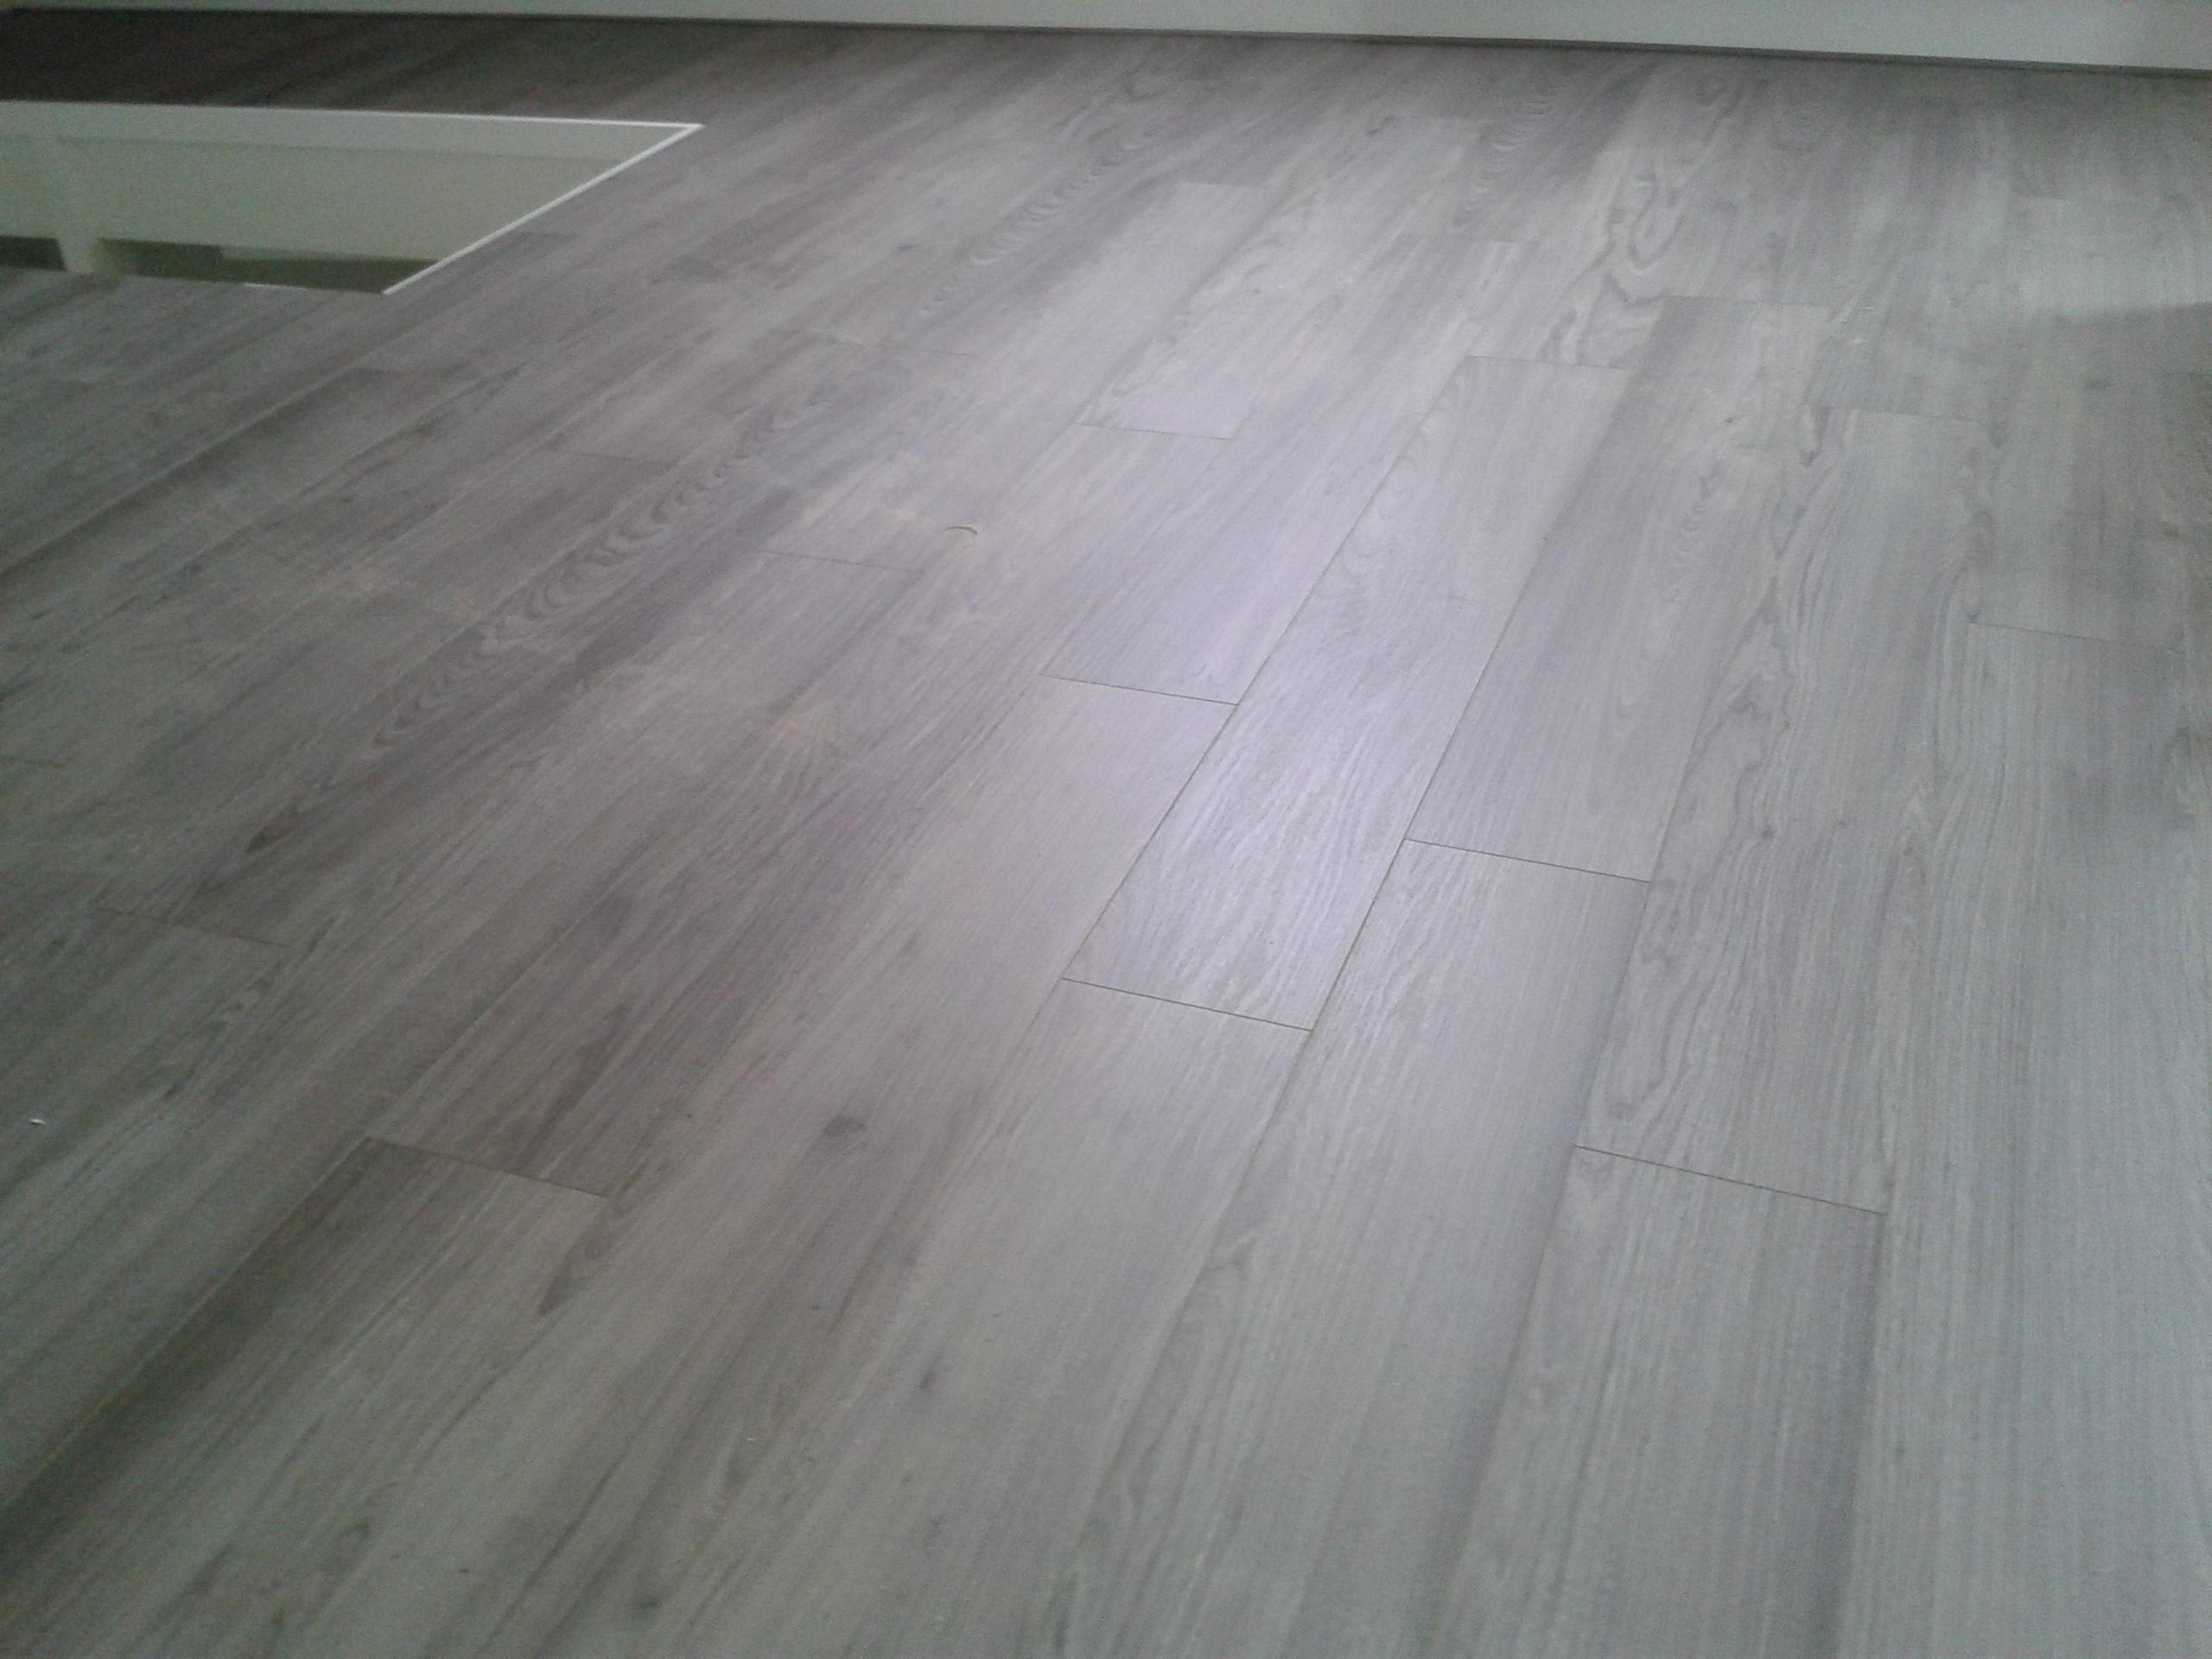 Pvc vloeren kleuren. cheap pvc vloer dryback in diverse kleuren va